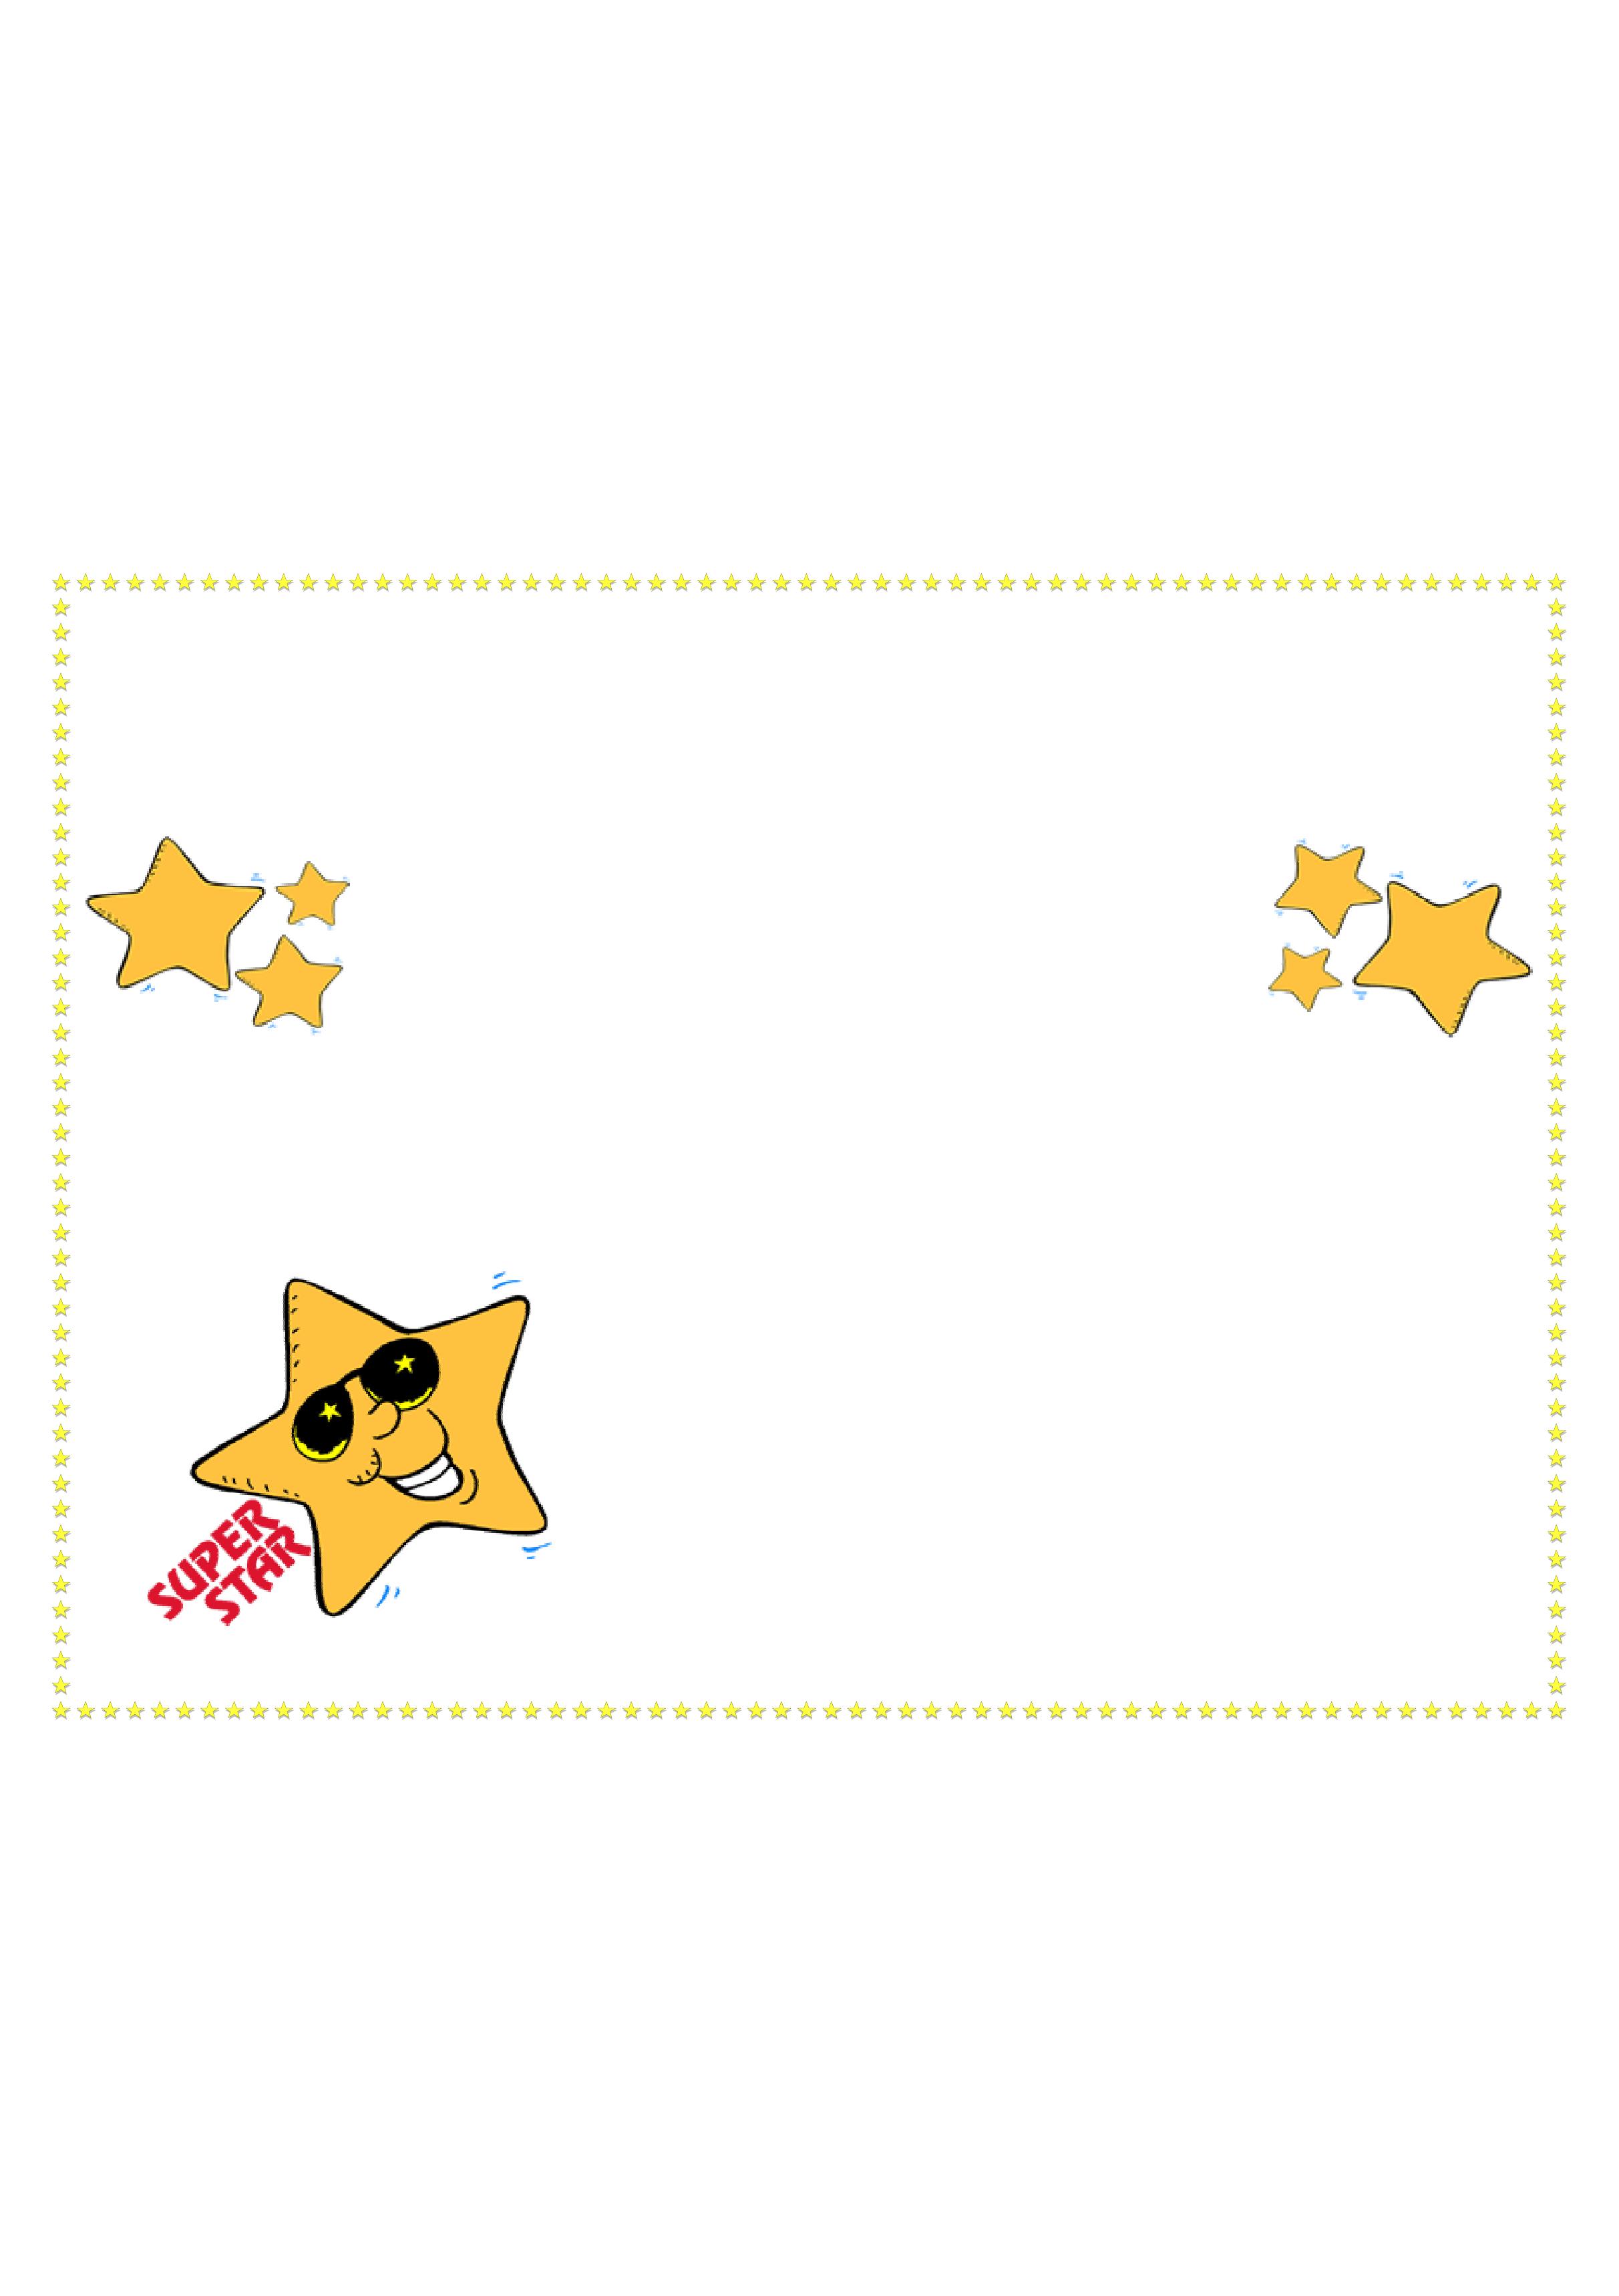 Star Award Certificate Template Free Download Intended For Star Award Certificate Template